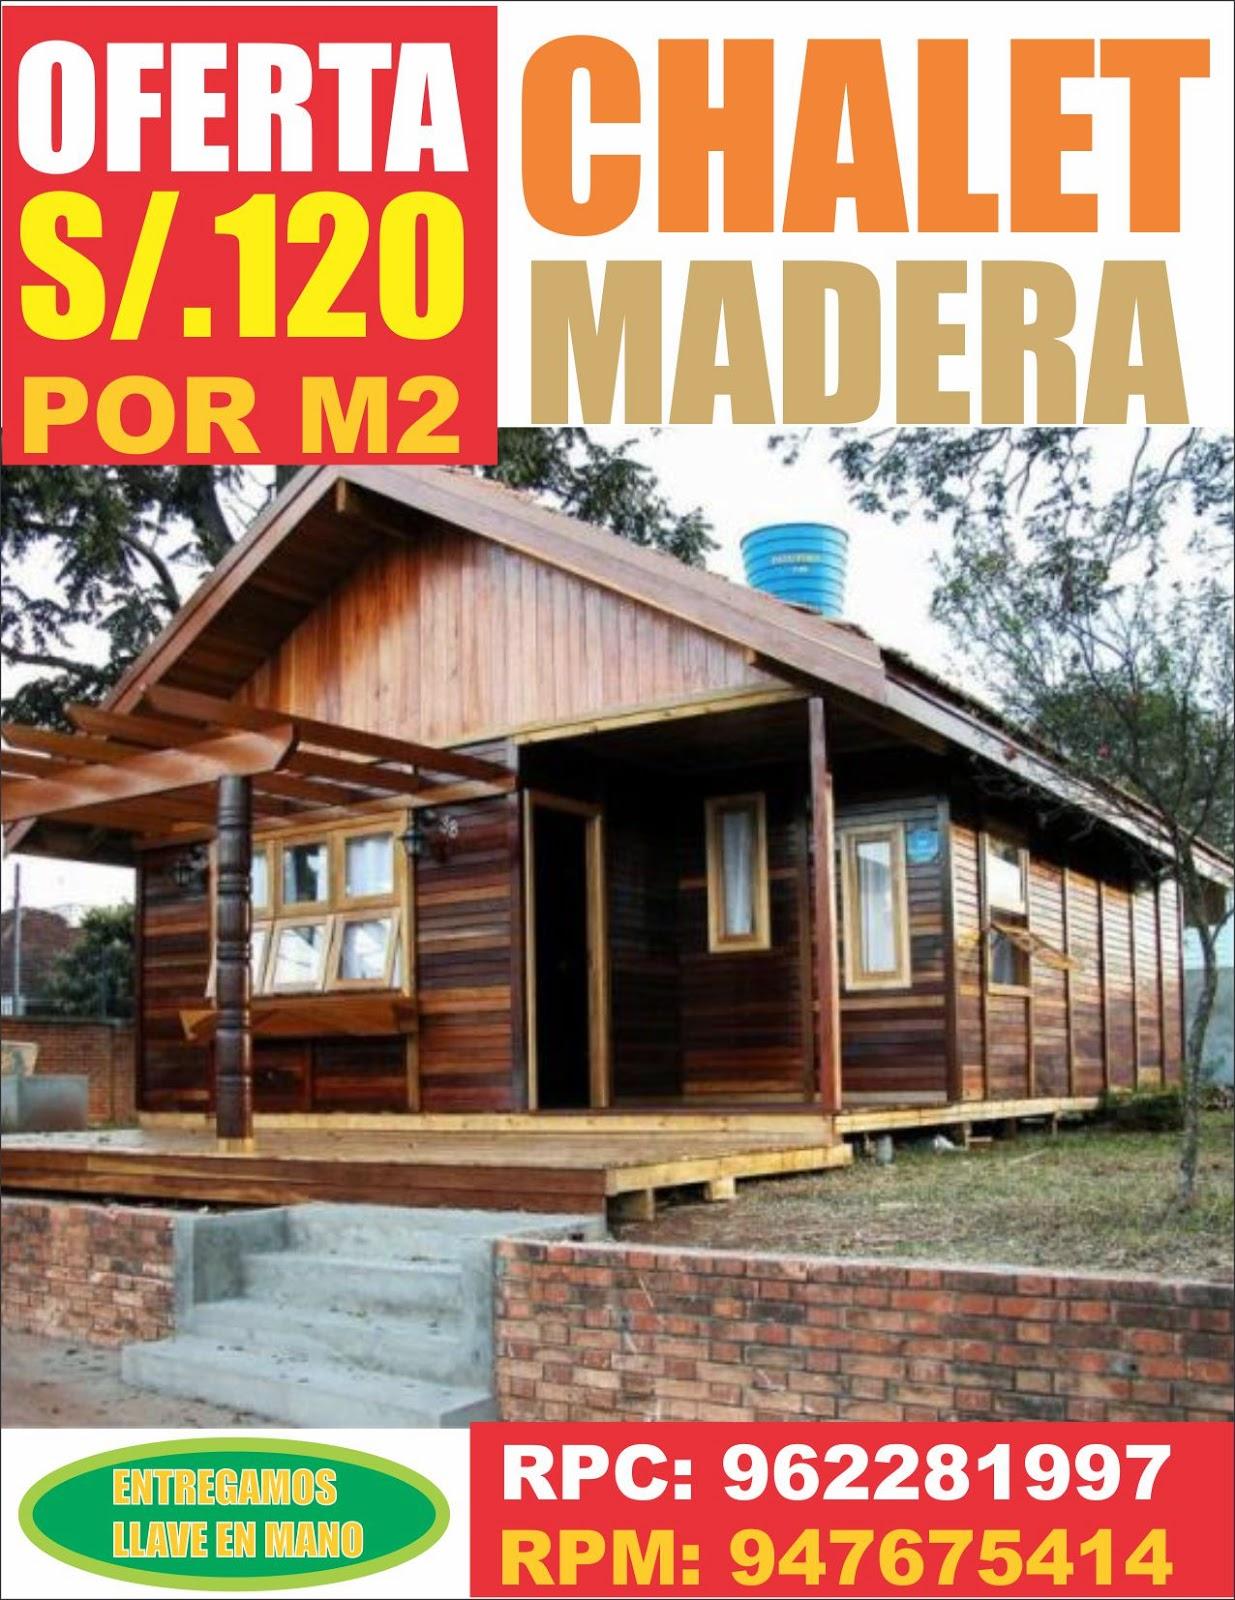 Casas pre fabricadas de madera en lima per for Casas prefabricadas de madera precios